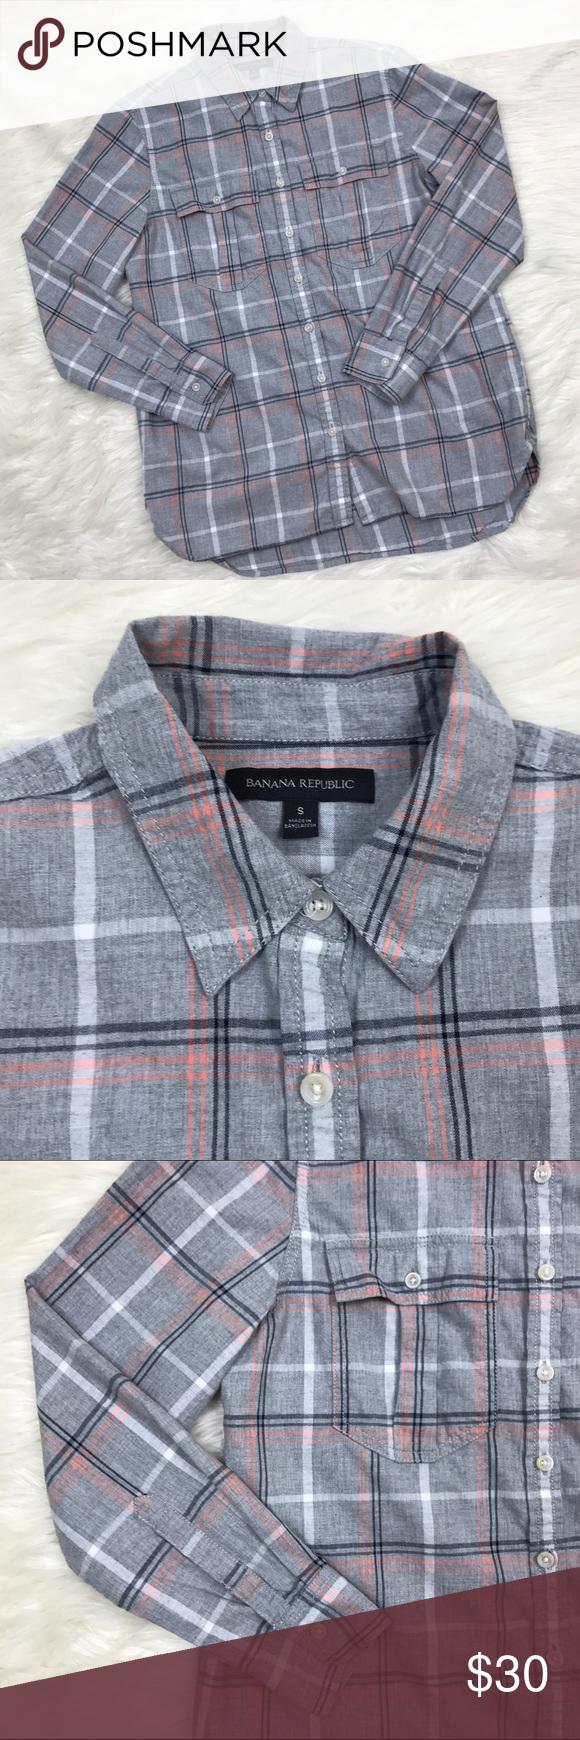 Flannel shirt black and grey  Banana Republic Gray Plaid Flannel Shirt Pockets Long sleeve